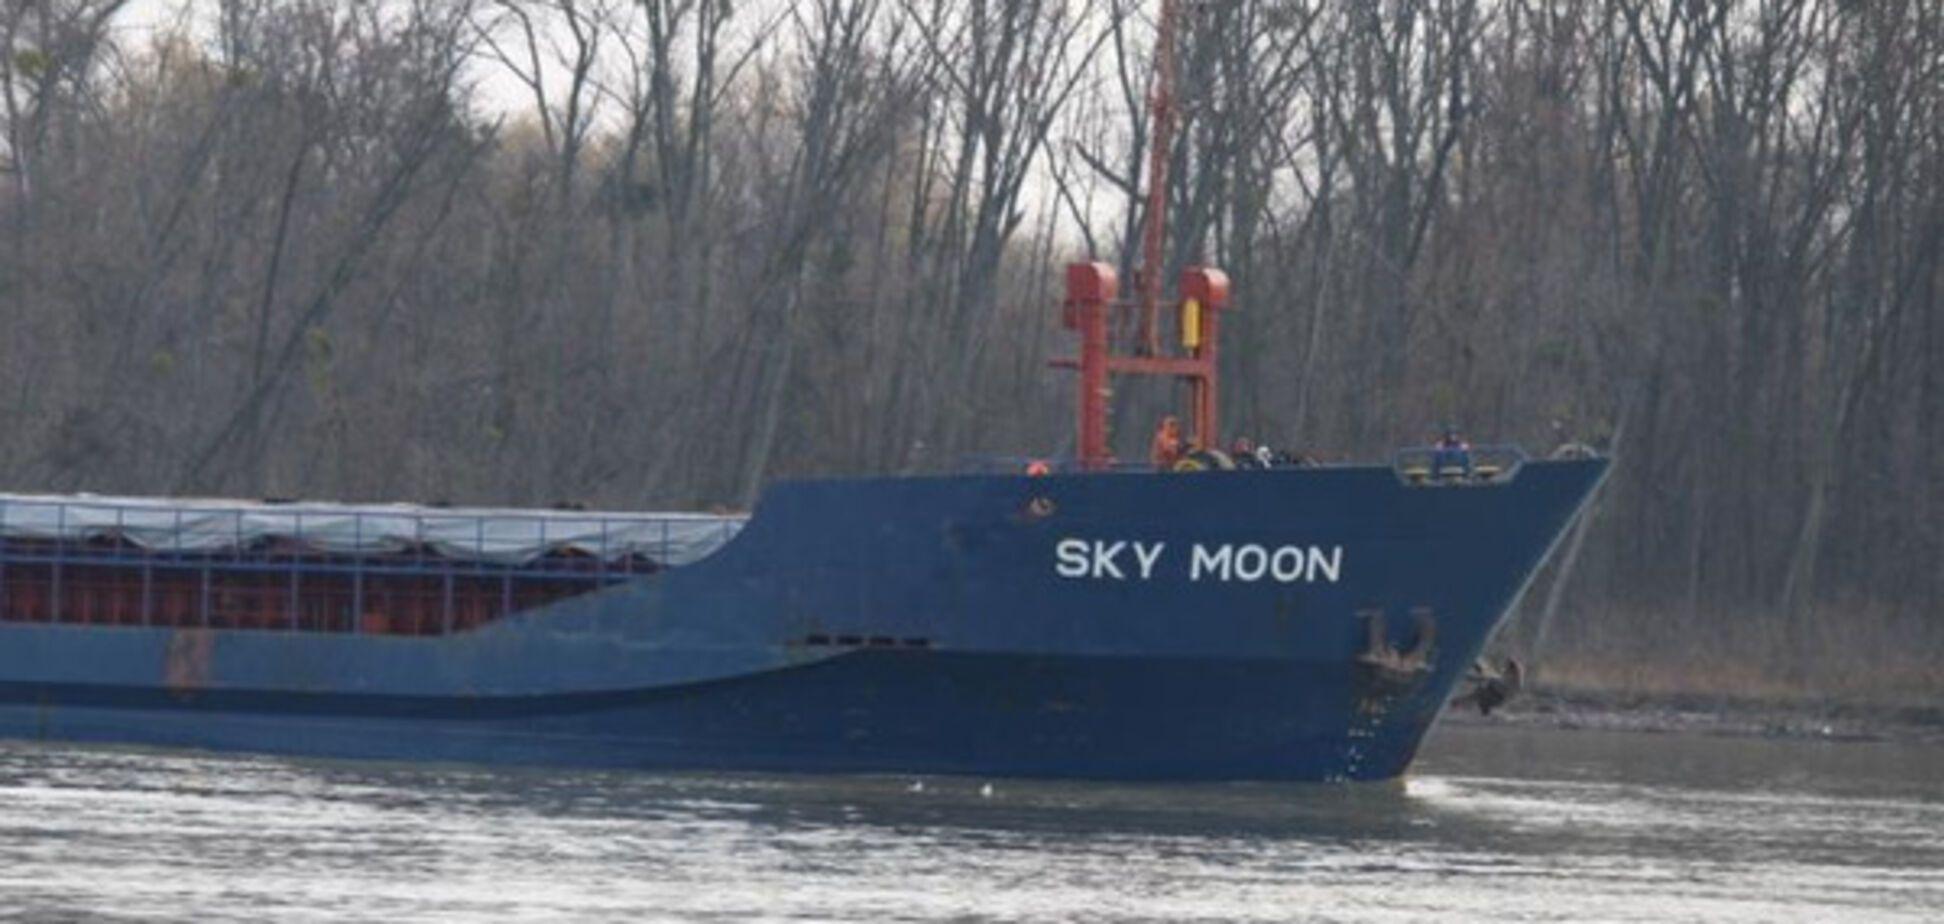 Судно Sky moon